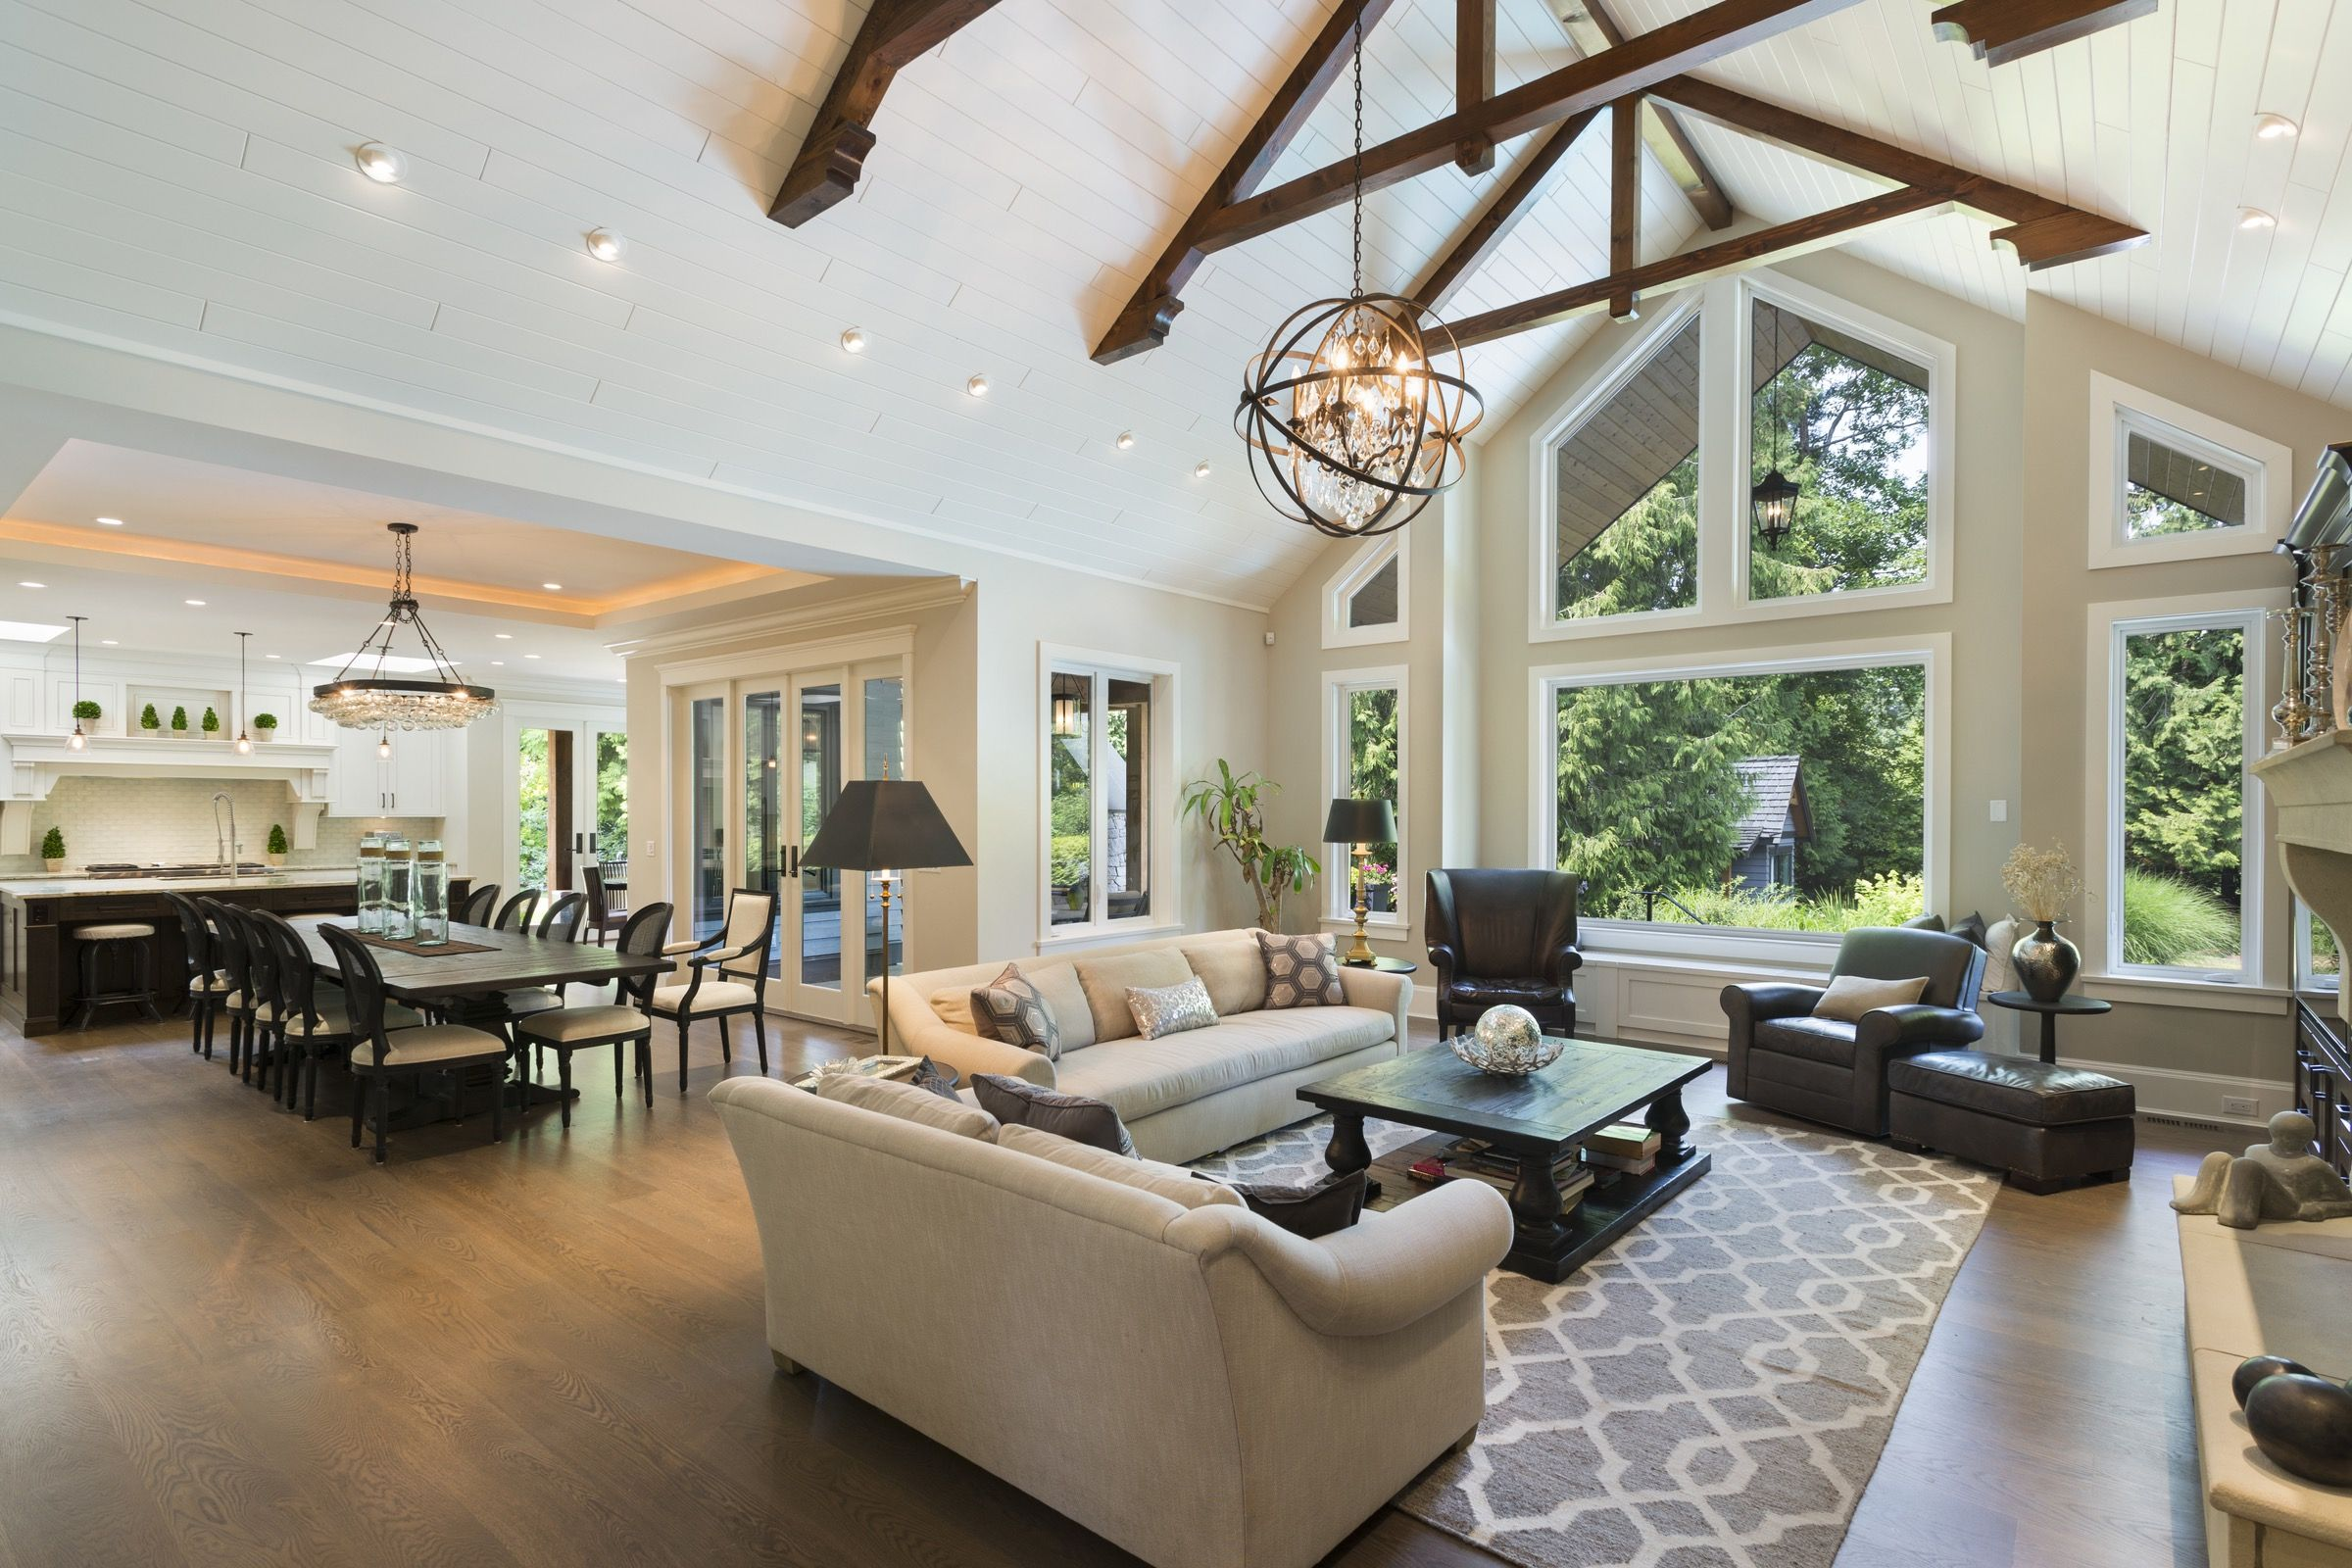 25 Open Plan Living & Dining Room Designs